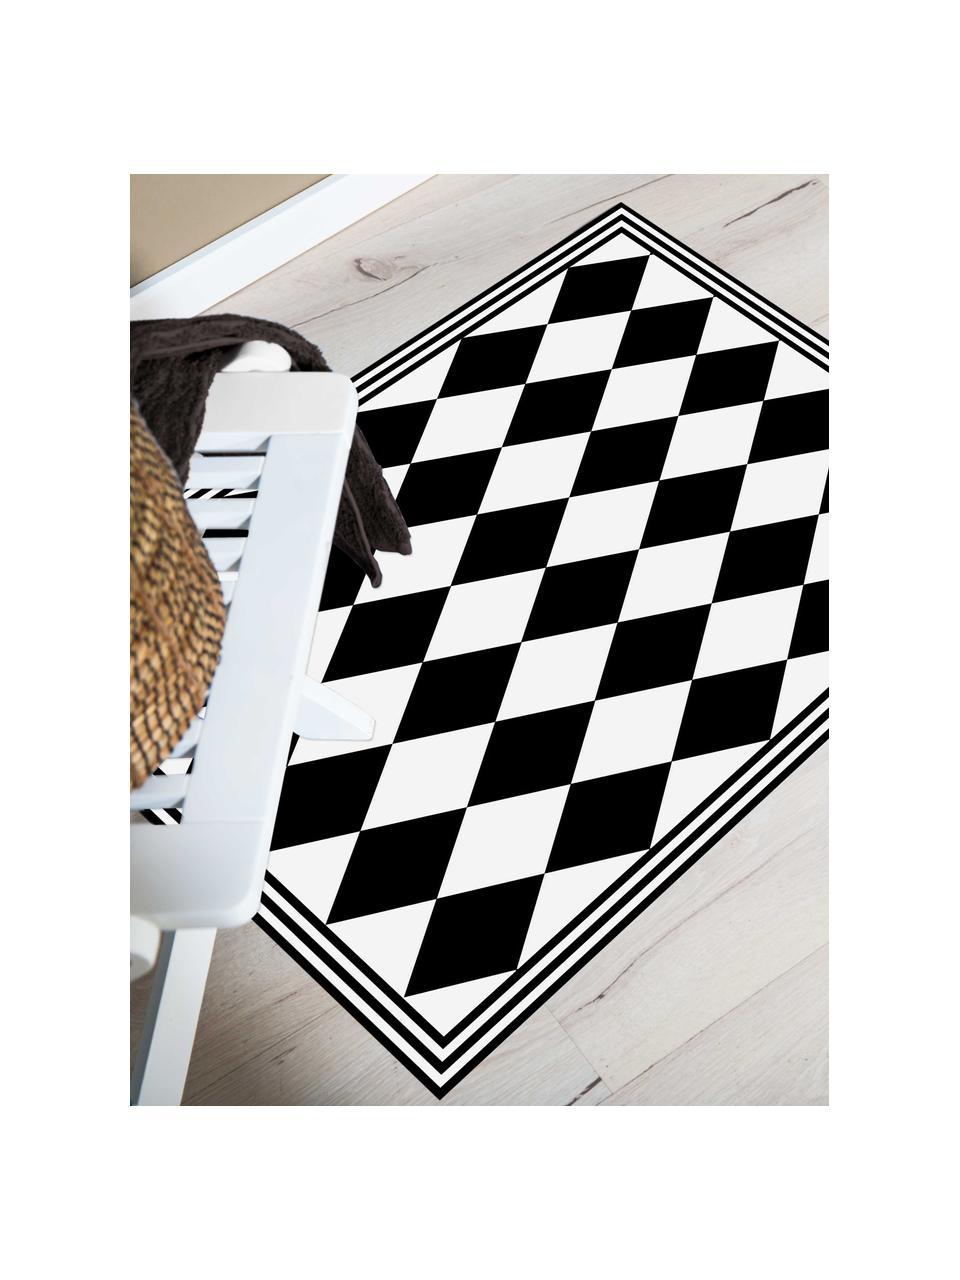 Vlakke vinyl vloermat Bobby II in zwart / wit, antislip, Recyclebaar vinyl, Zwart, wit, 65 x 85 cm